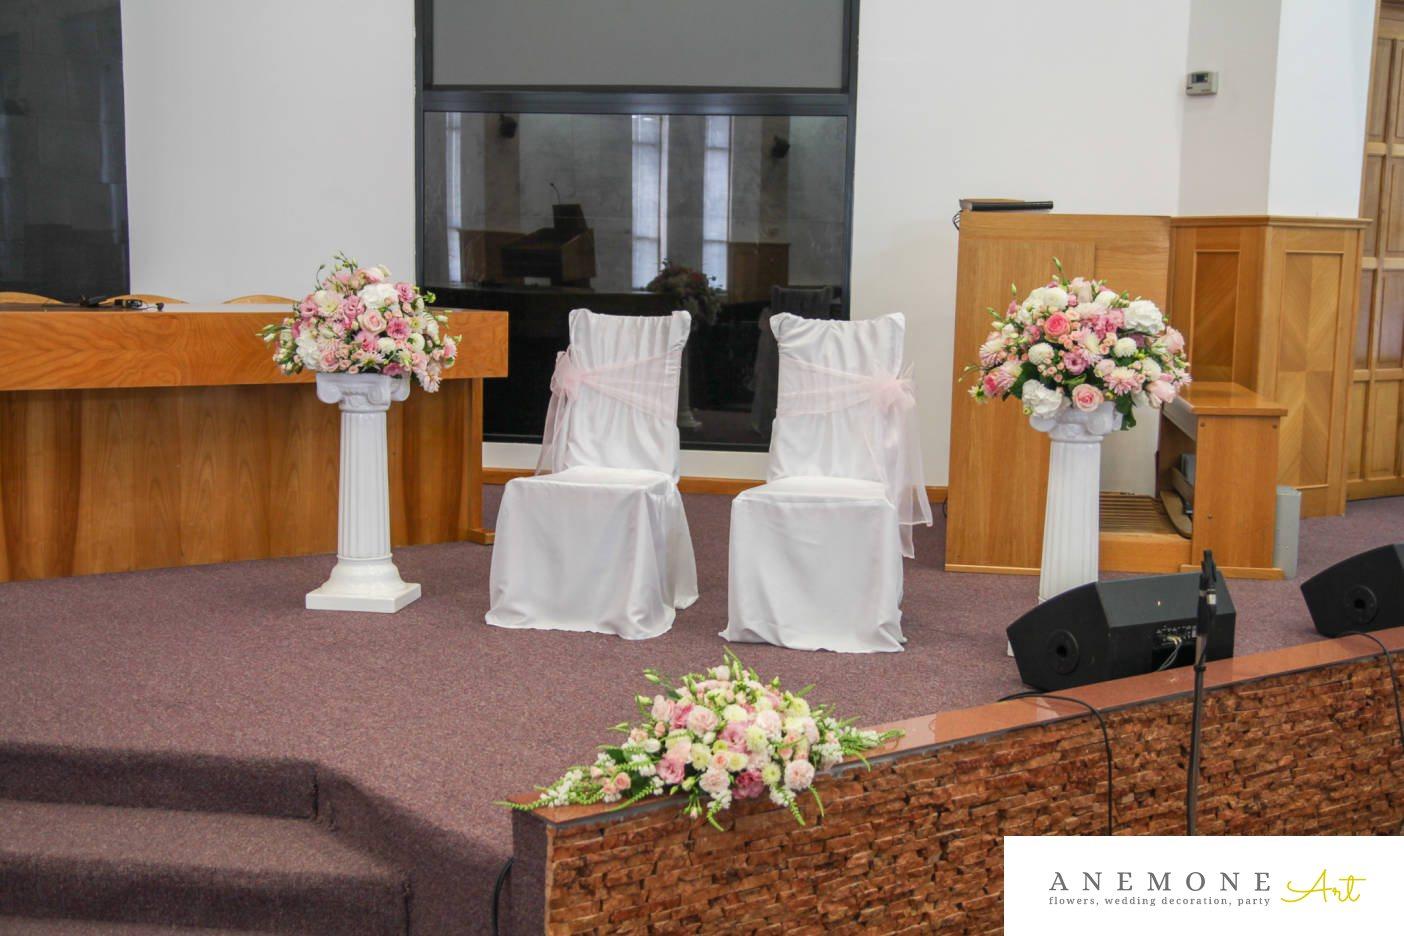 Poza, foto cu Flori de nunta alb, dalia, decor biserica, lisianthus, roz in Arad, Timisoara, Oradea (wedding flowers, bouquets) nunta Arad, Timisoara, Oradea